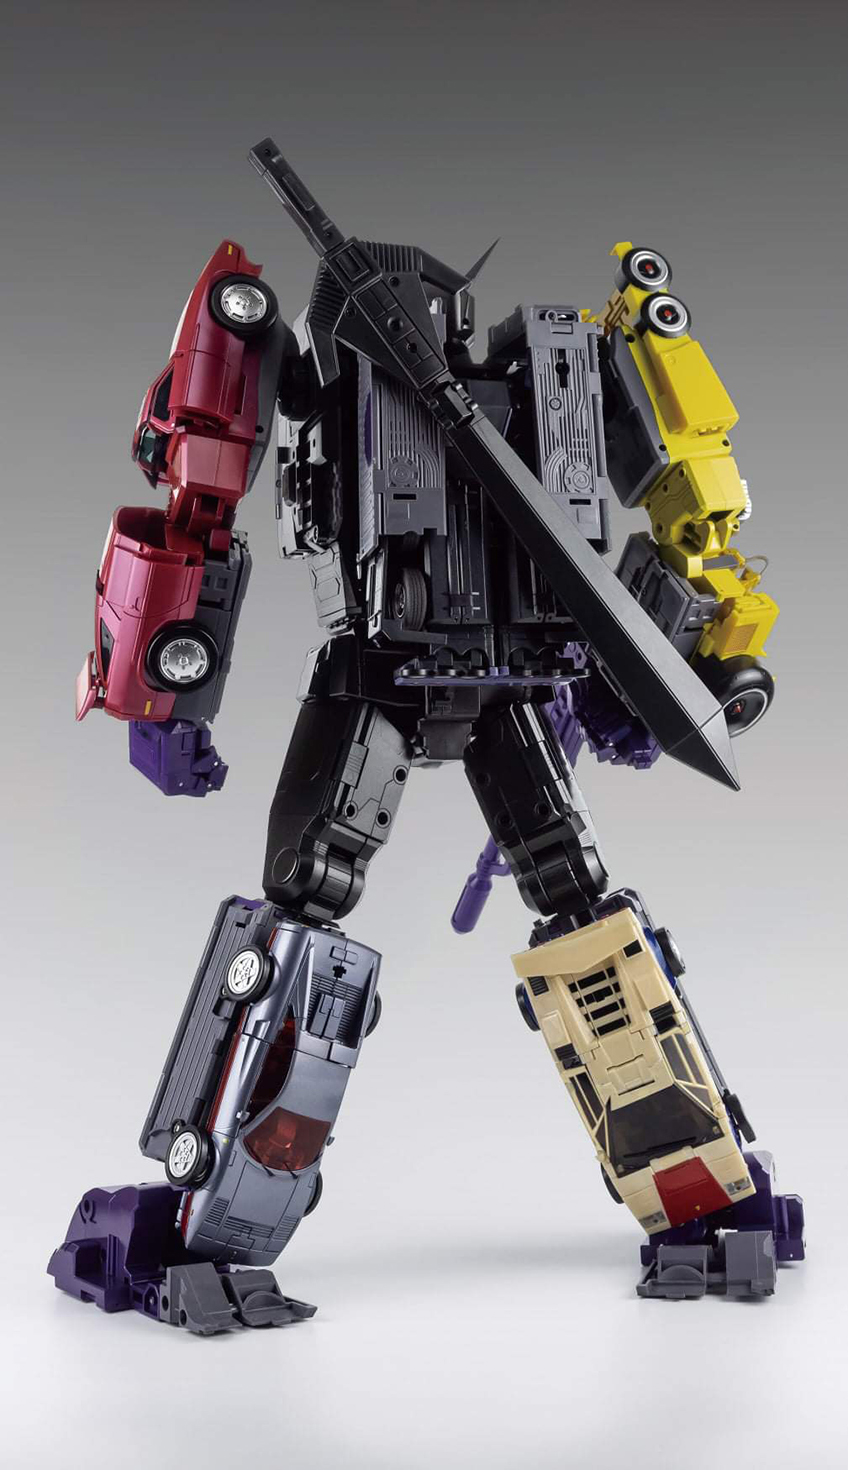 [X-Transbots] Produit Tiers - Jouets Berserkars forme Monolith (MX-XIII à MX-VII) - aka Stunticons forme Menasor/Menaseur - Page 7 LNzutDXG_o